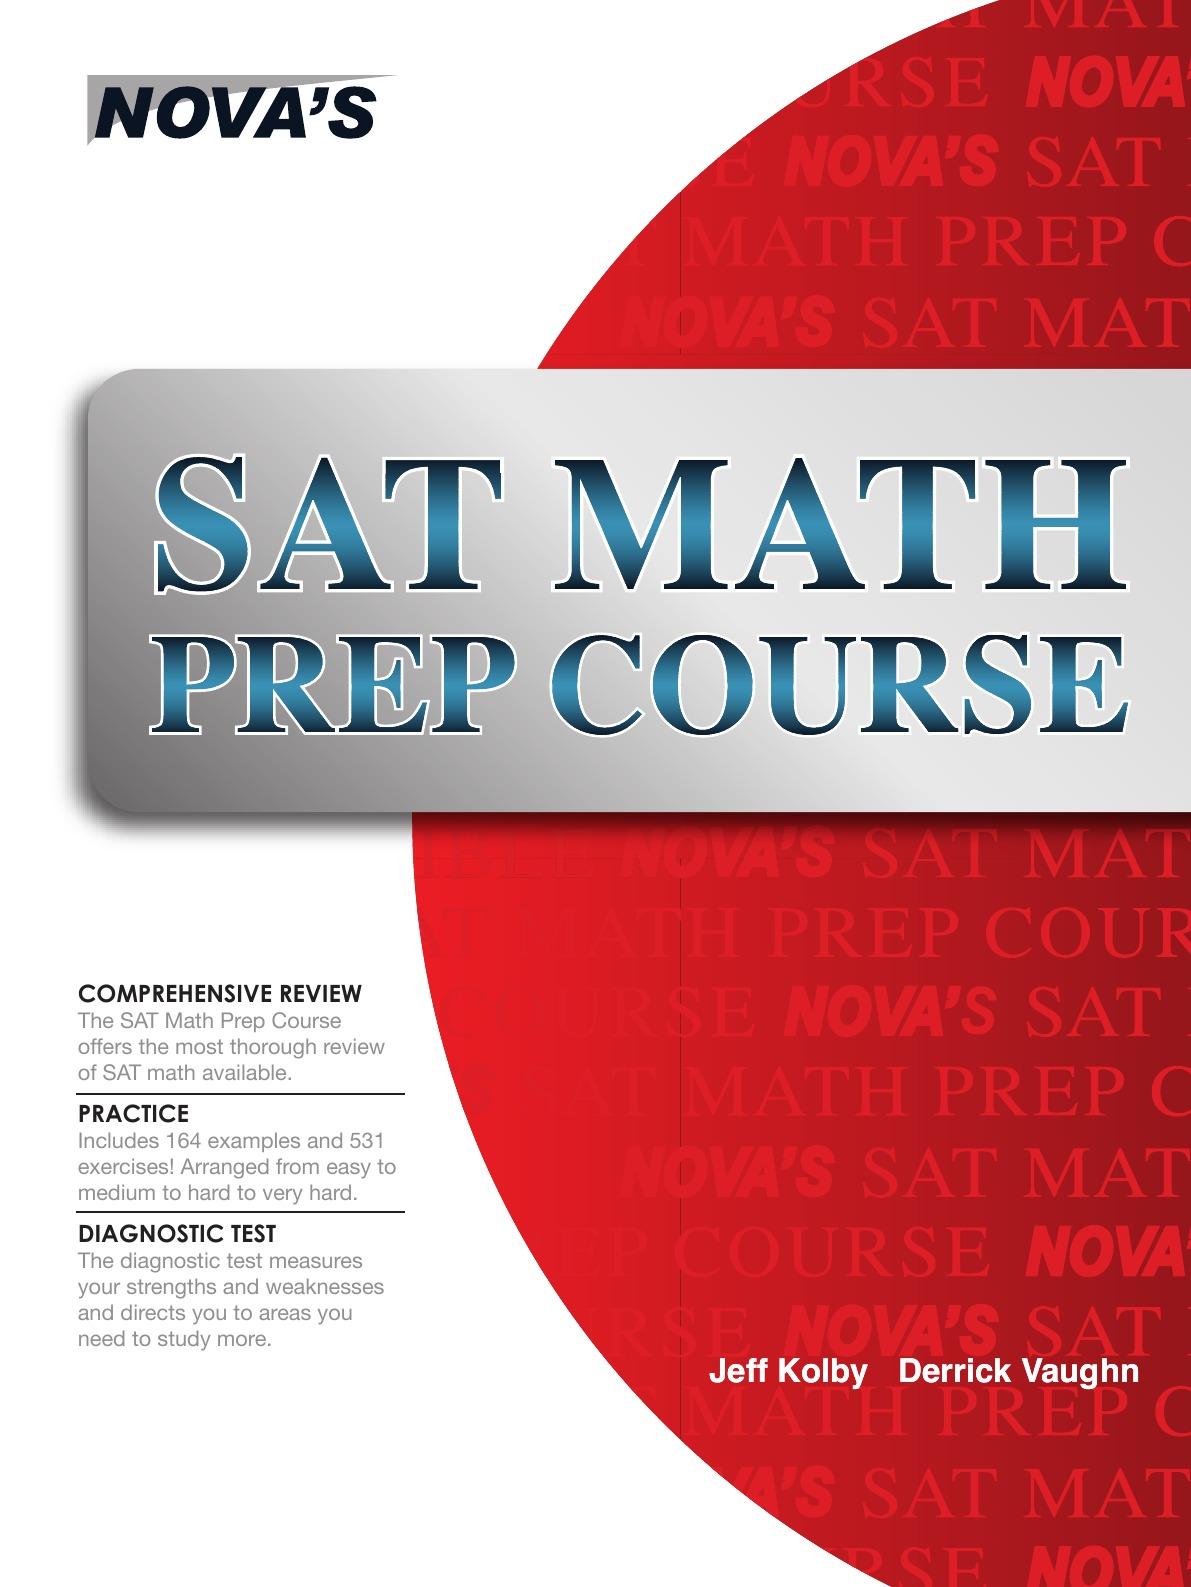 Jeff Kolby, Derrick Vaughn SAT Math Prep Course donald smith j bond math the theory behind the formulas